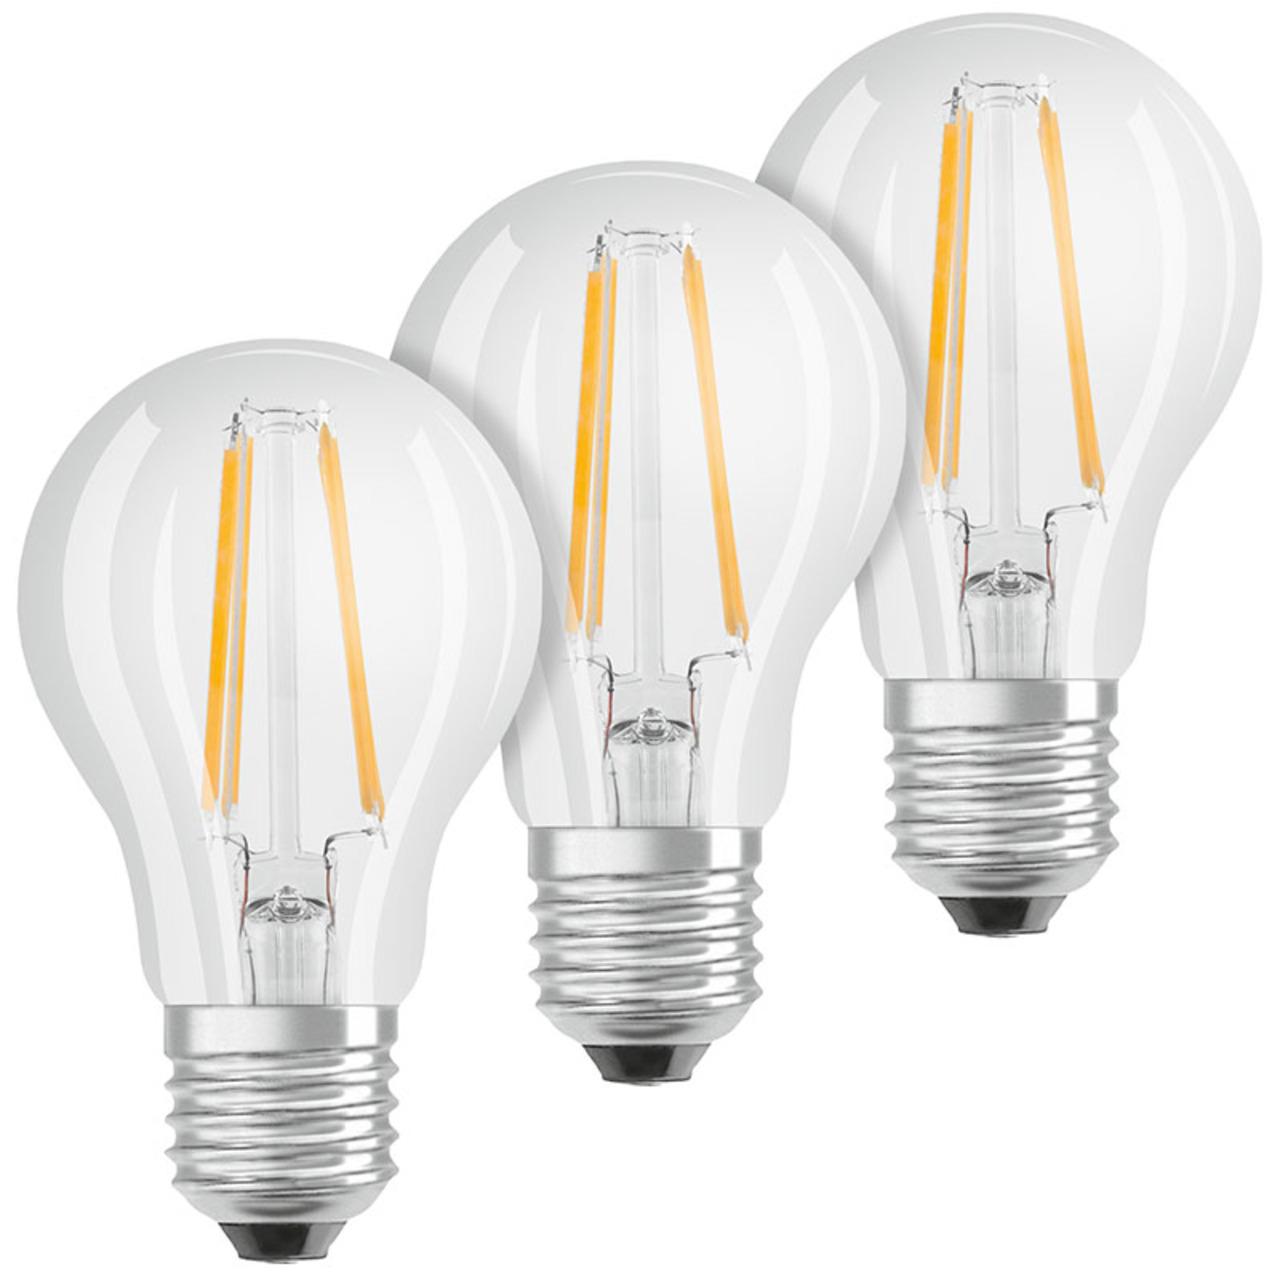 OSRAM 3er Set 7-W-LED-Lampe E27- dim to warm